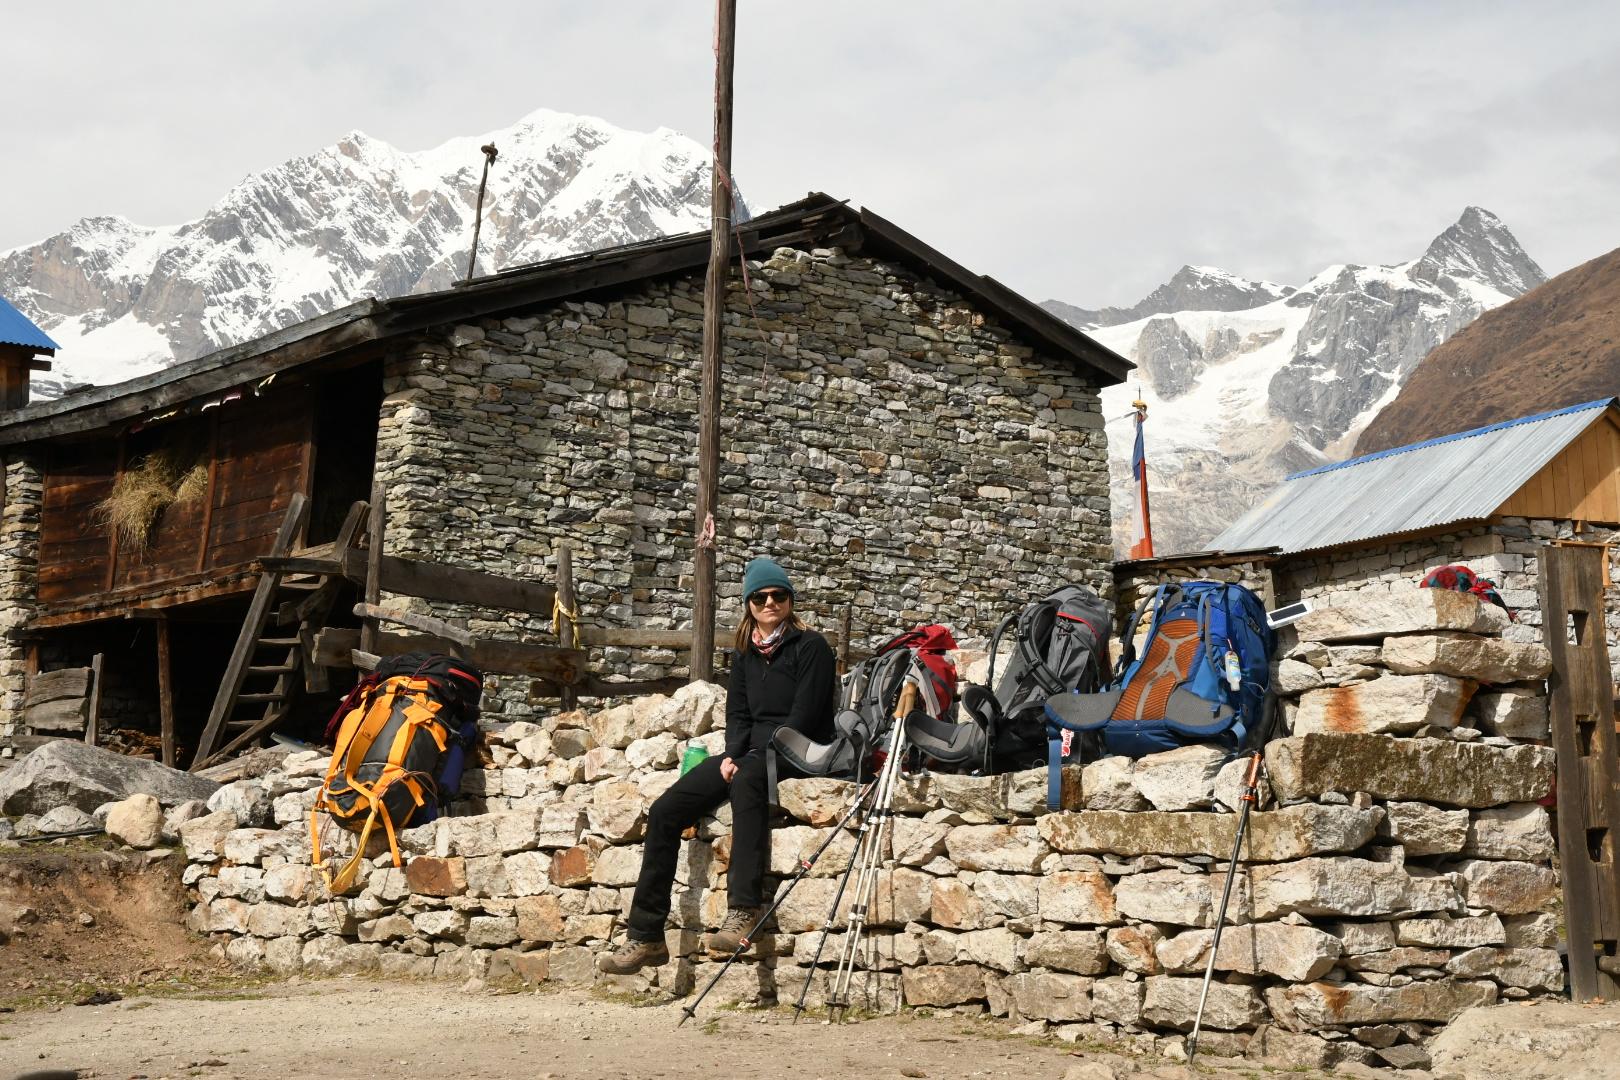 Stacie trekking in Nepal